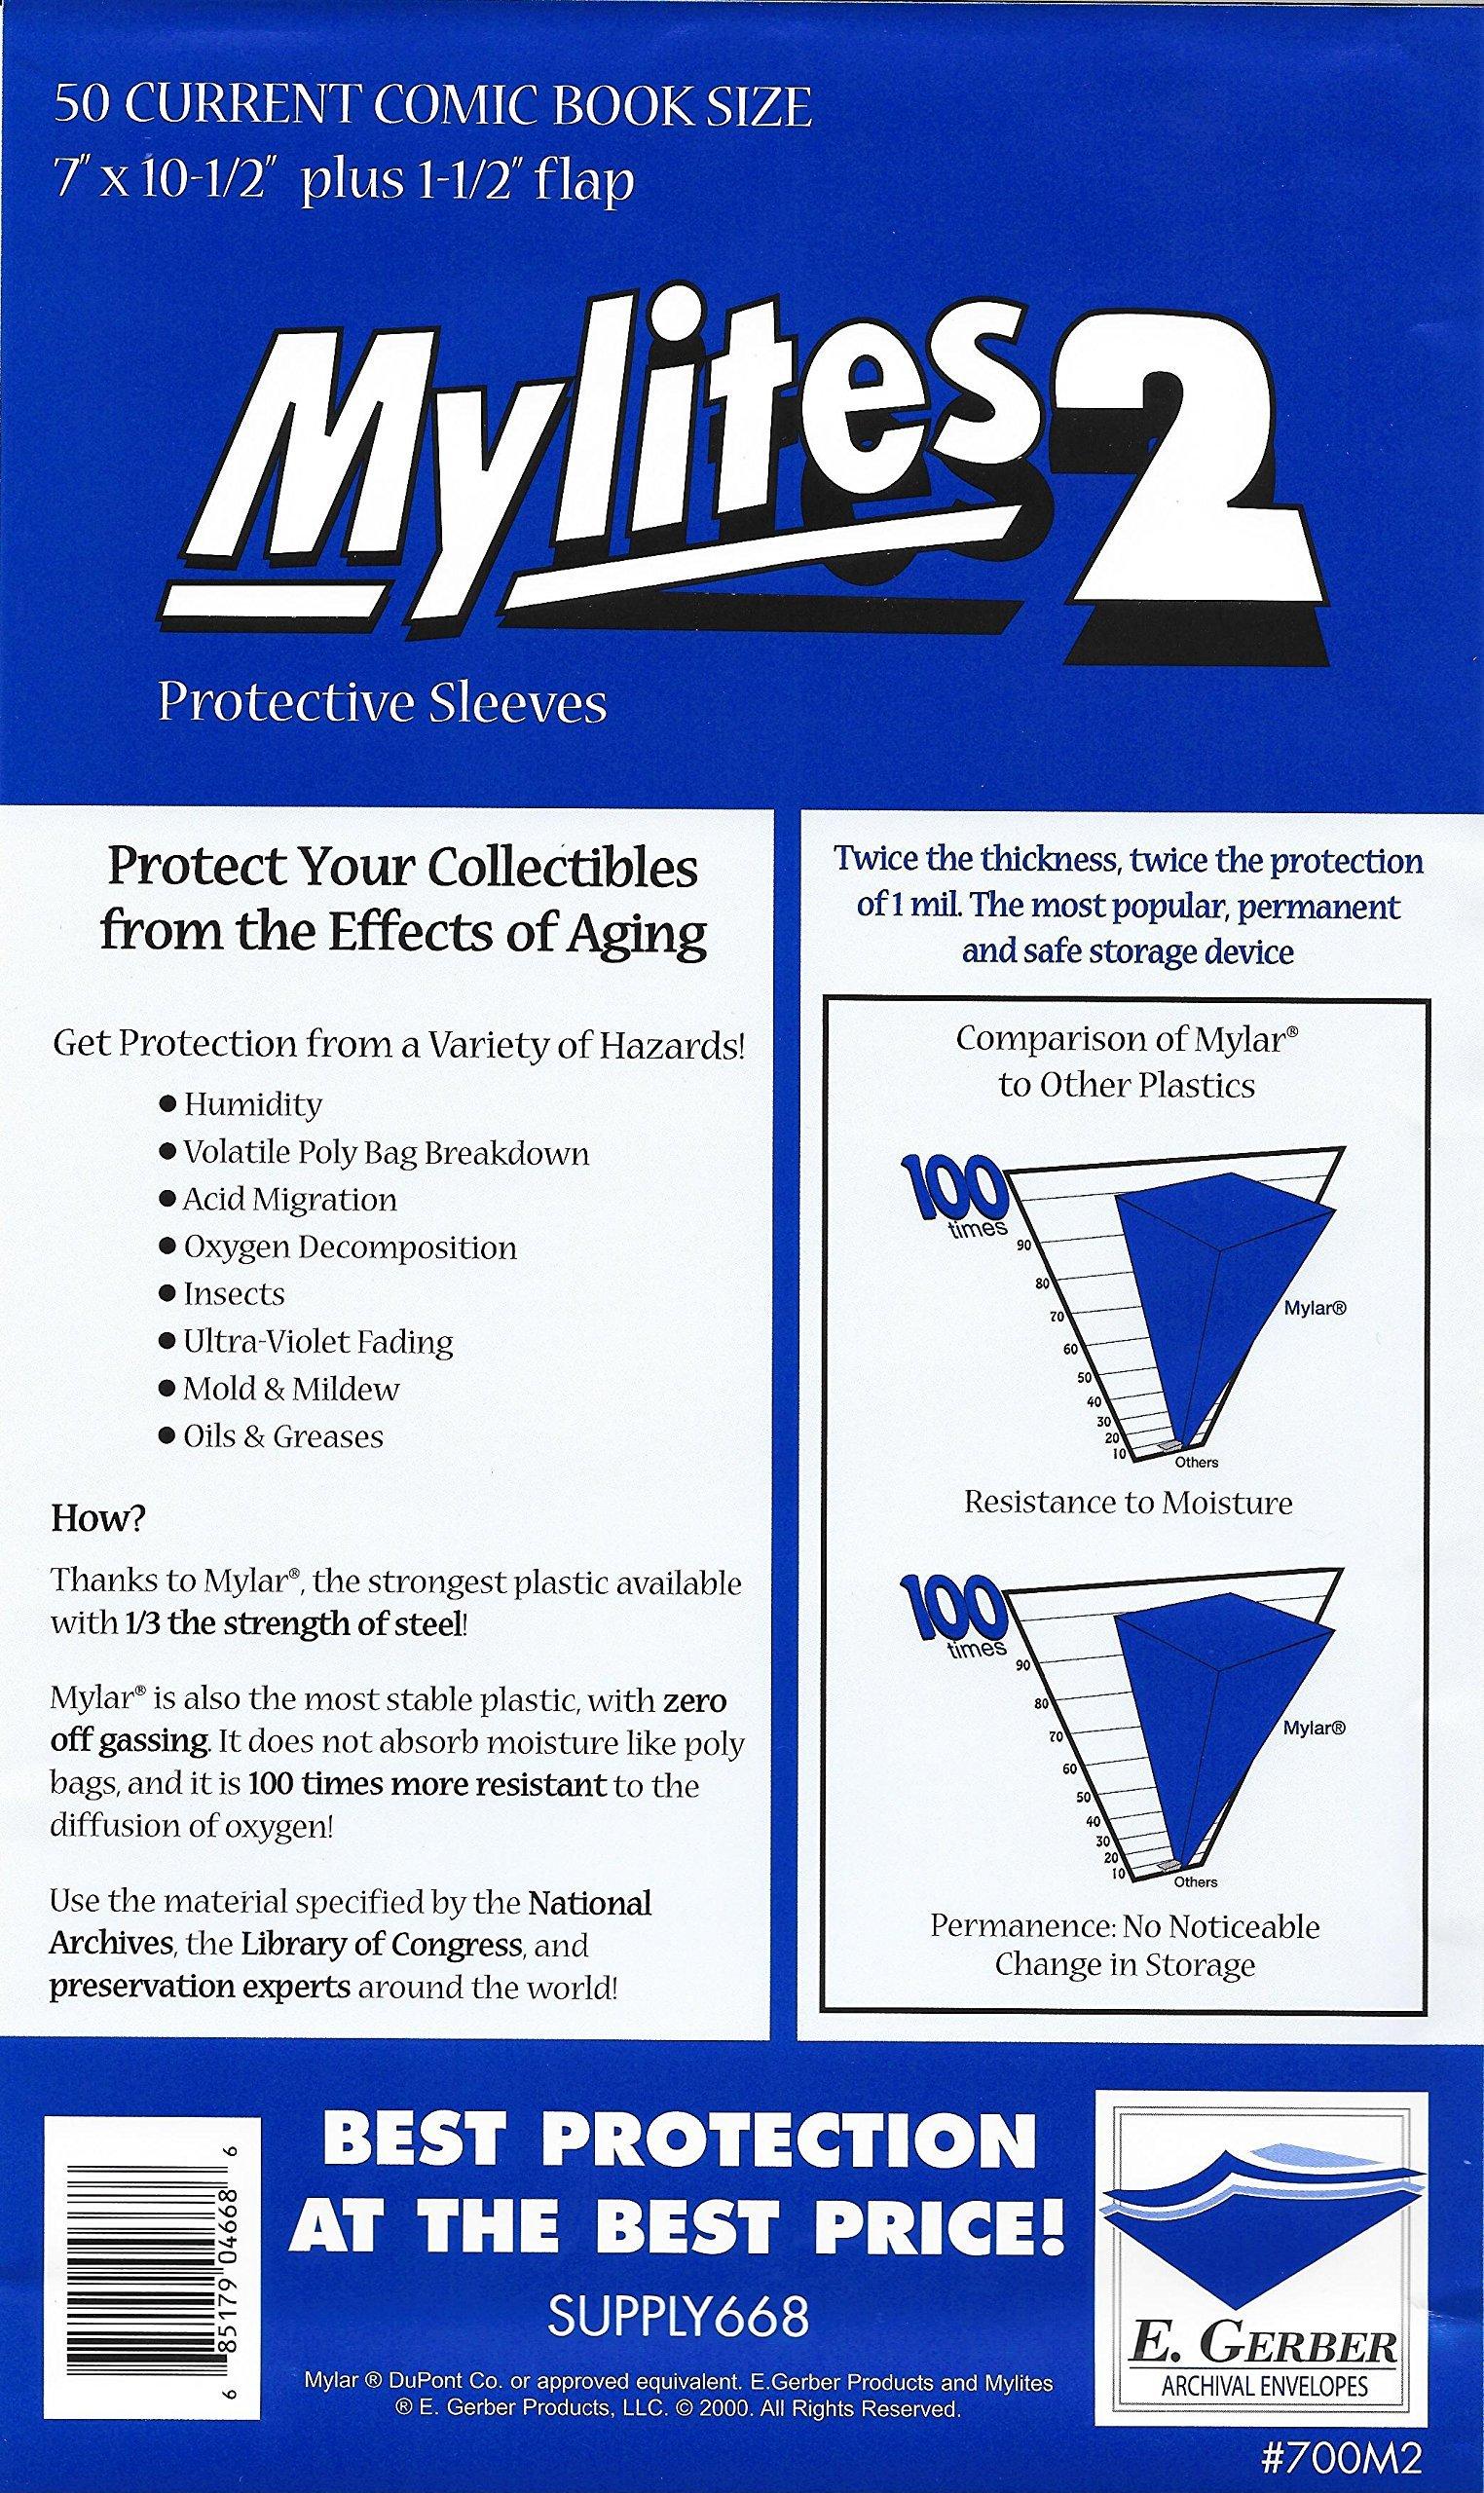 Mylites2 50 Pack - 2 Mil Current 7'' X 10-1/2'' Plus 1-1/2'' Flap